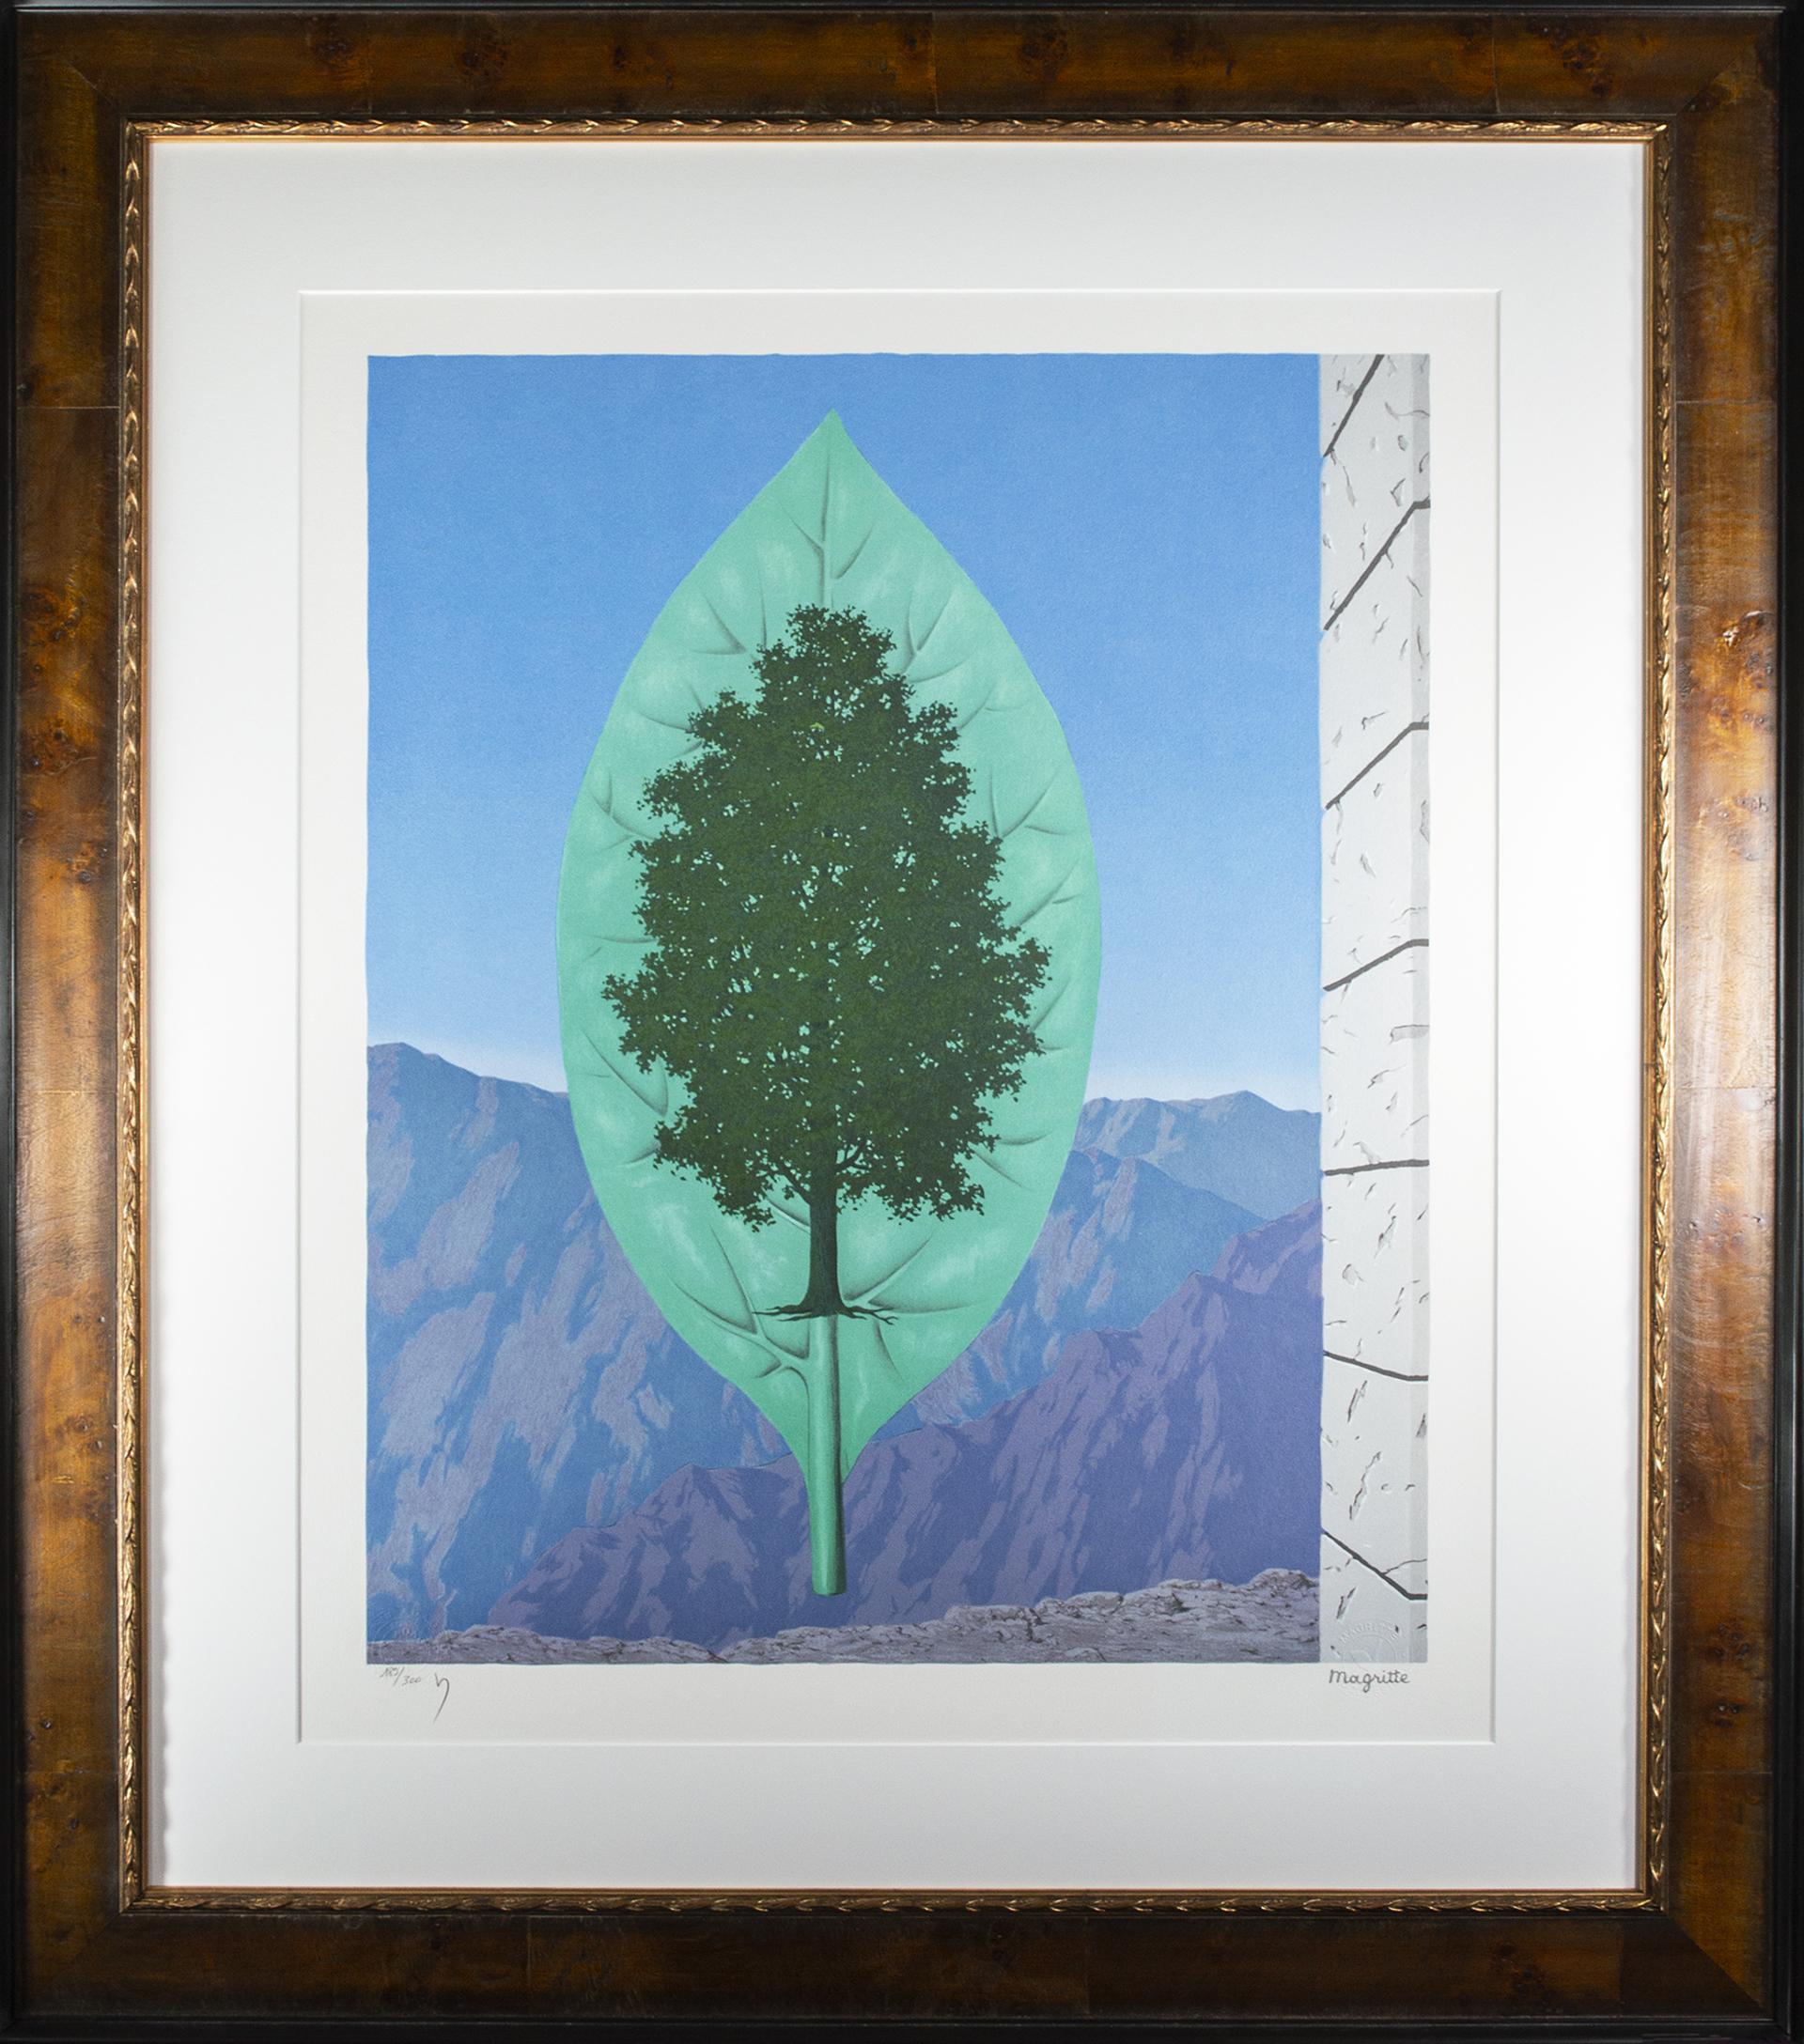 Le Dernier Cri (The Last Word) by Rene Magritte